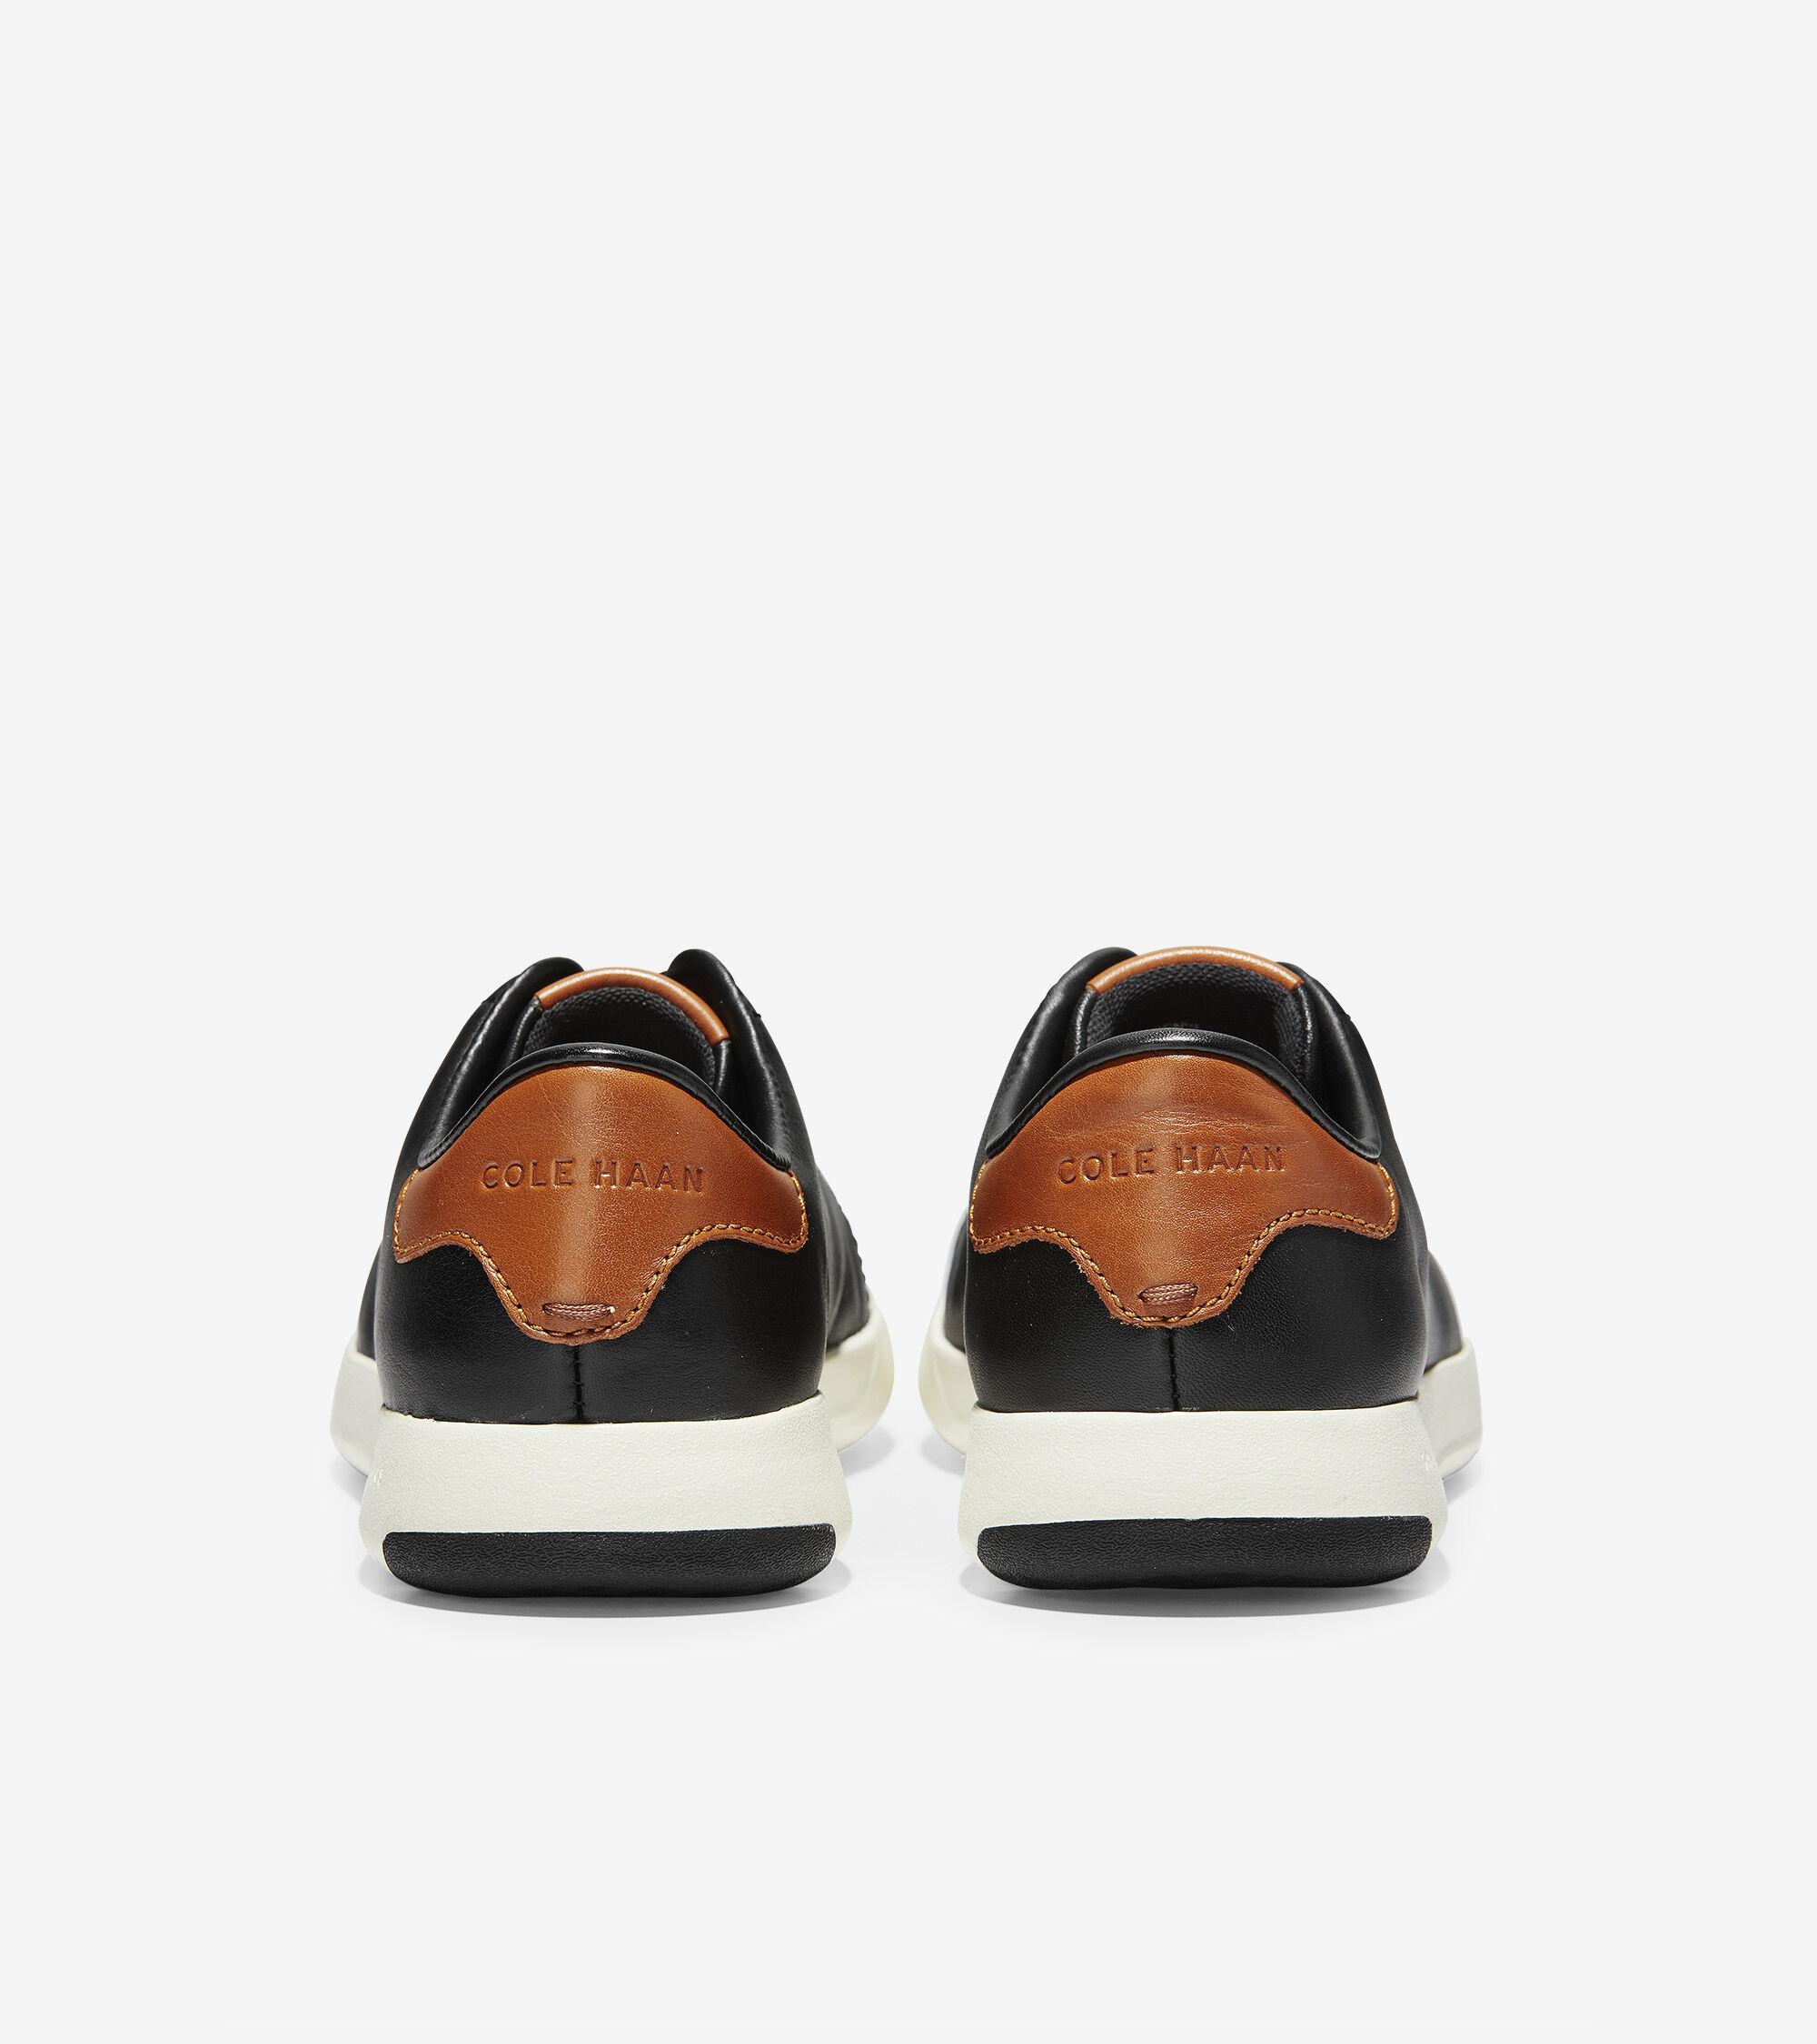 Grandpro Tennis Sneakers In Black British Tan Cole Haan D Island Shoes Slip On Comfort Leather Dark Brown Mens Grandpr Sneaker